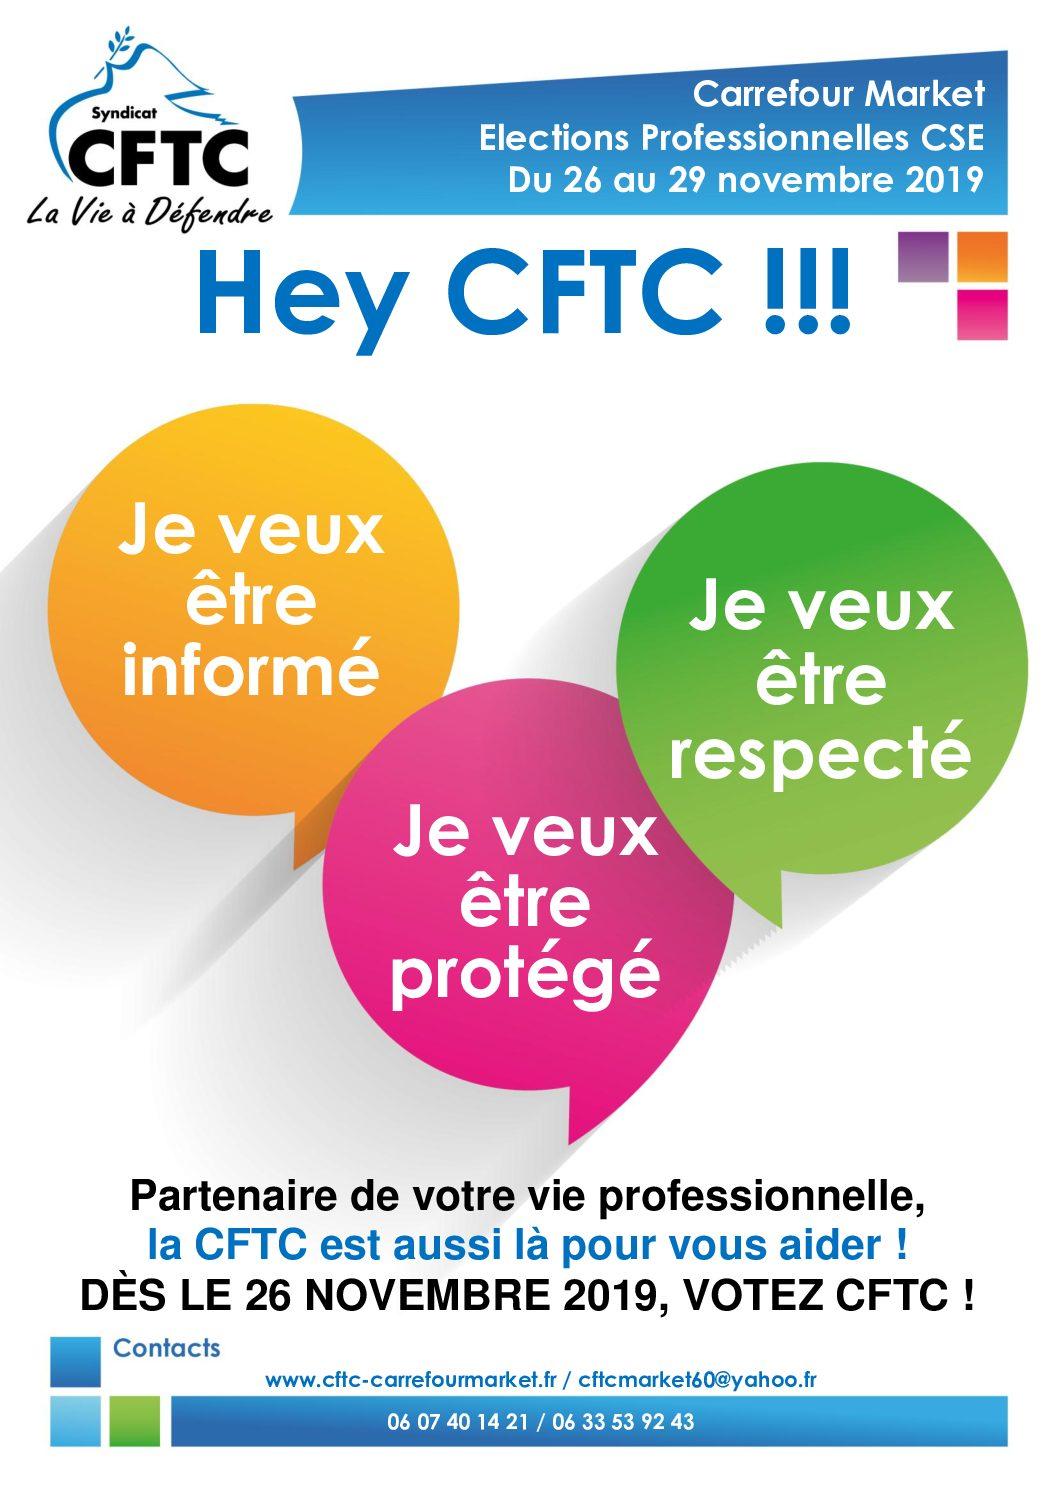 HEY CFTC